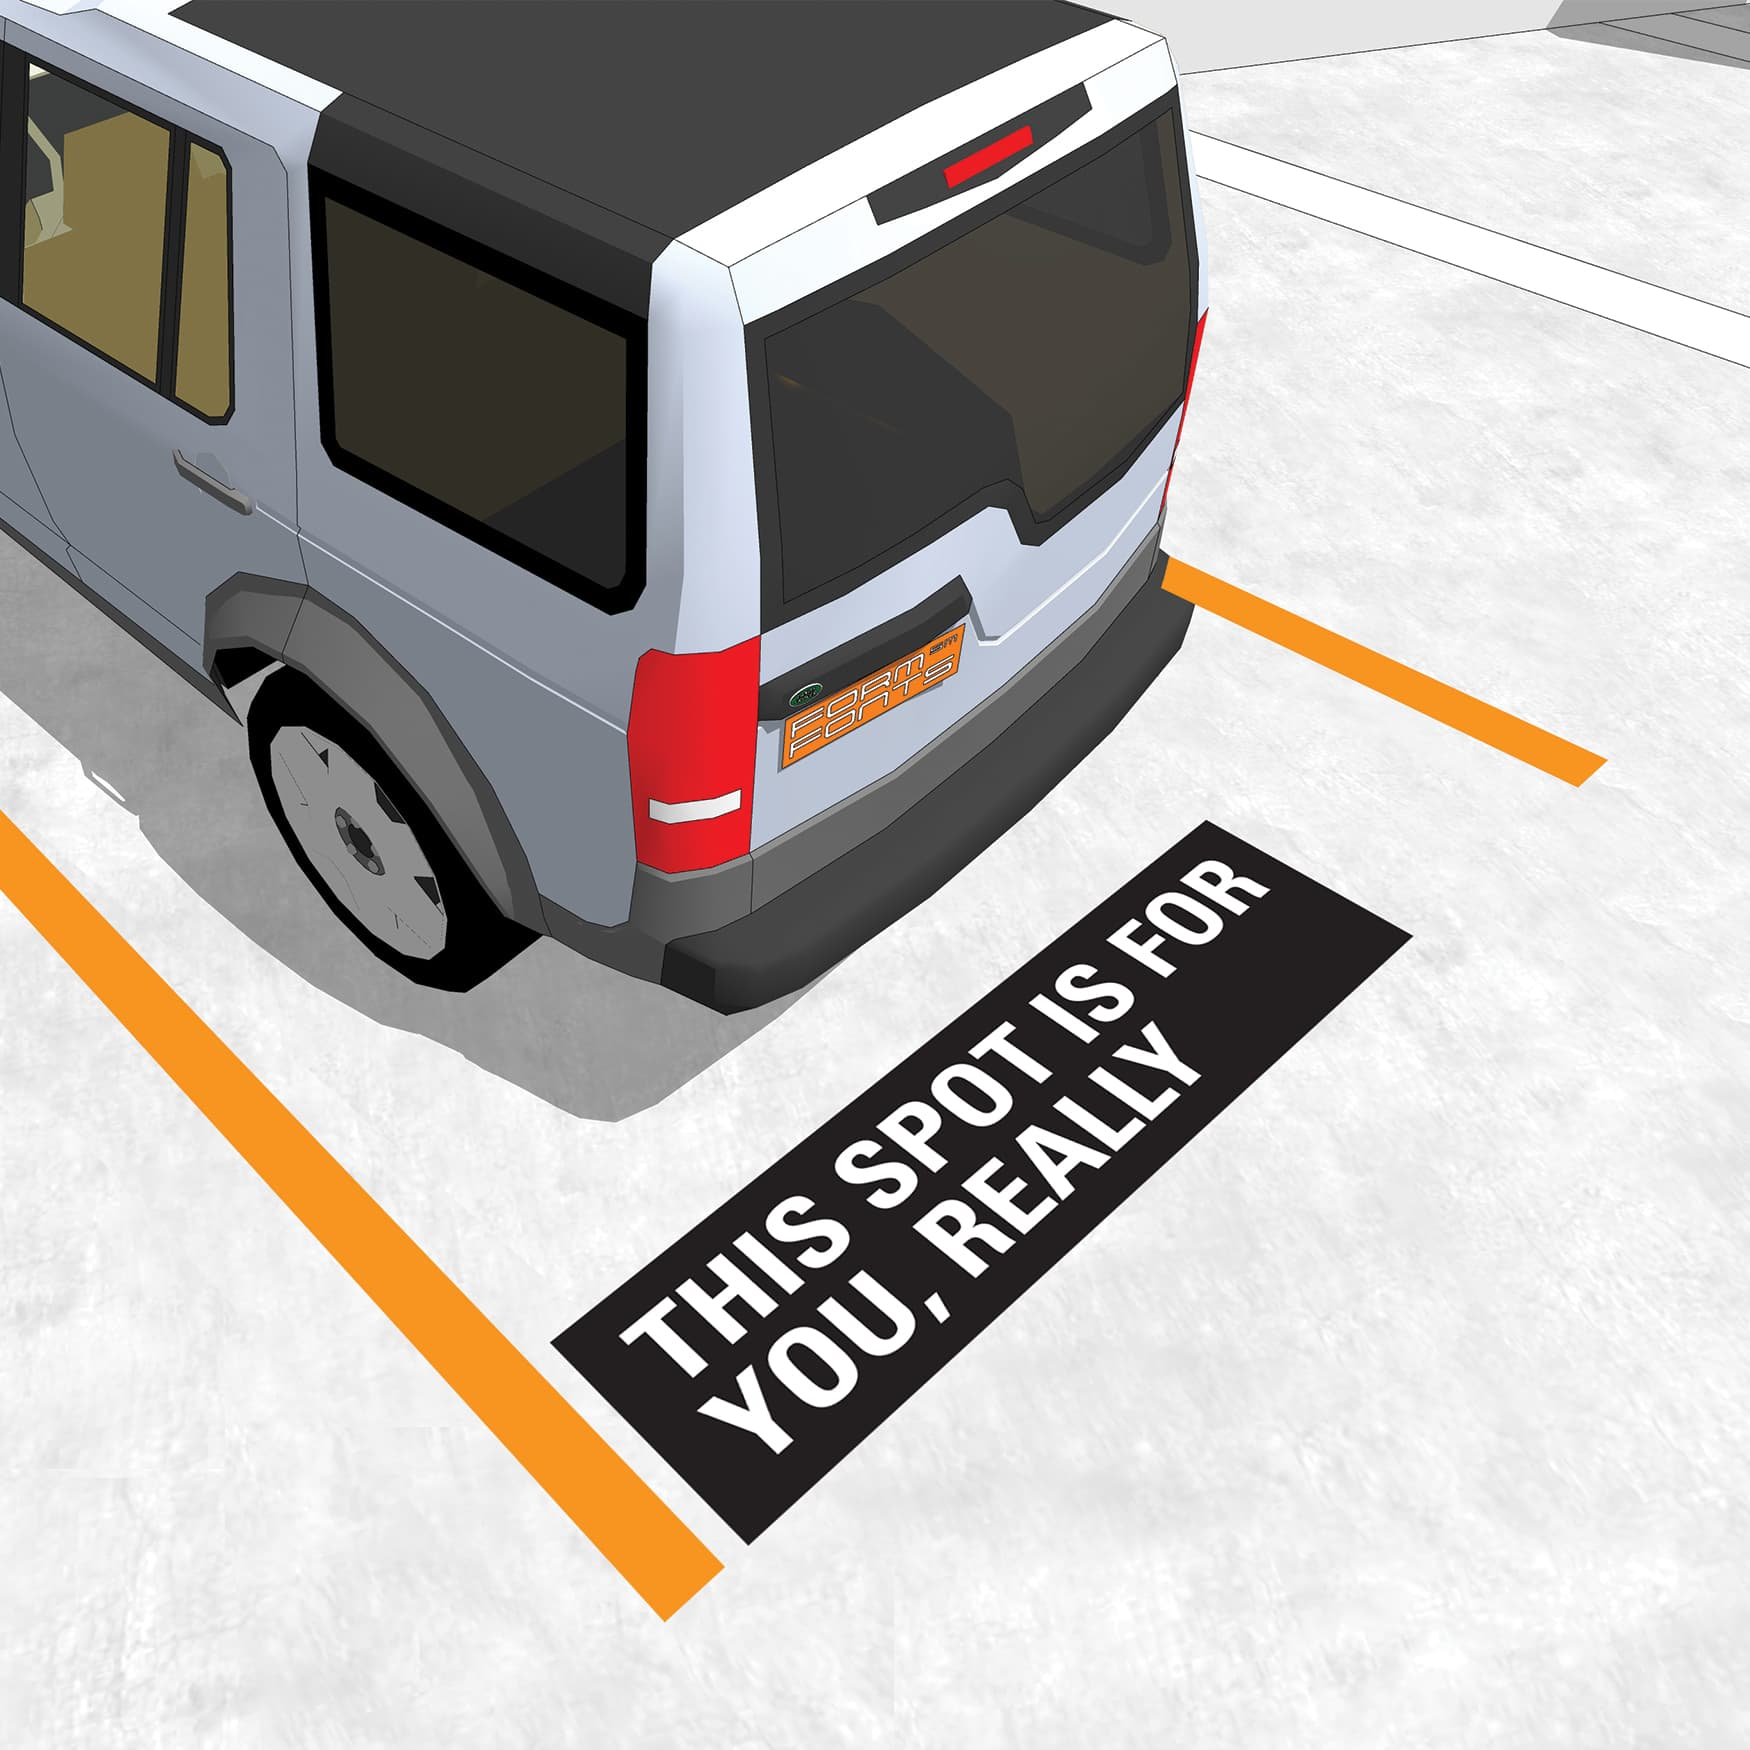 specialty graphics in parking stall, parking garage design by RSM Design